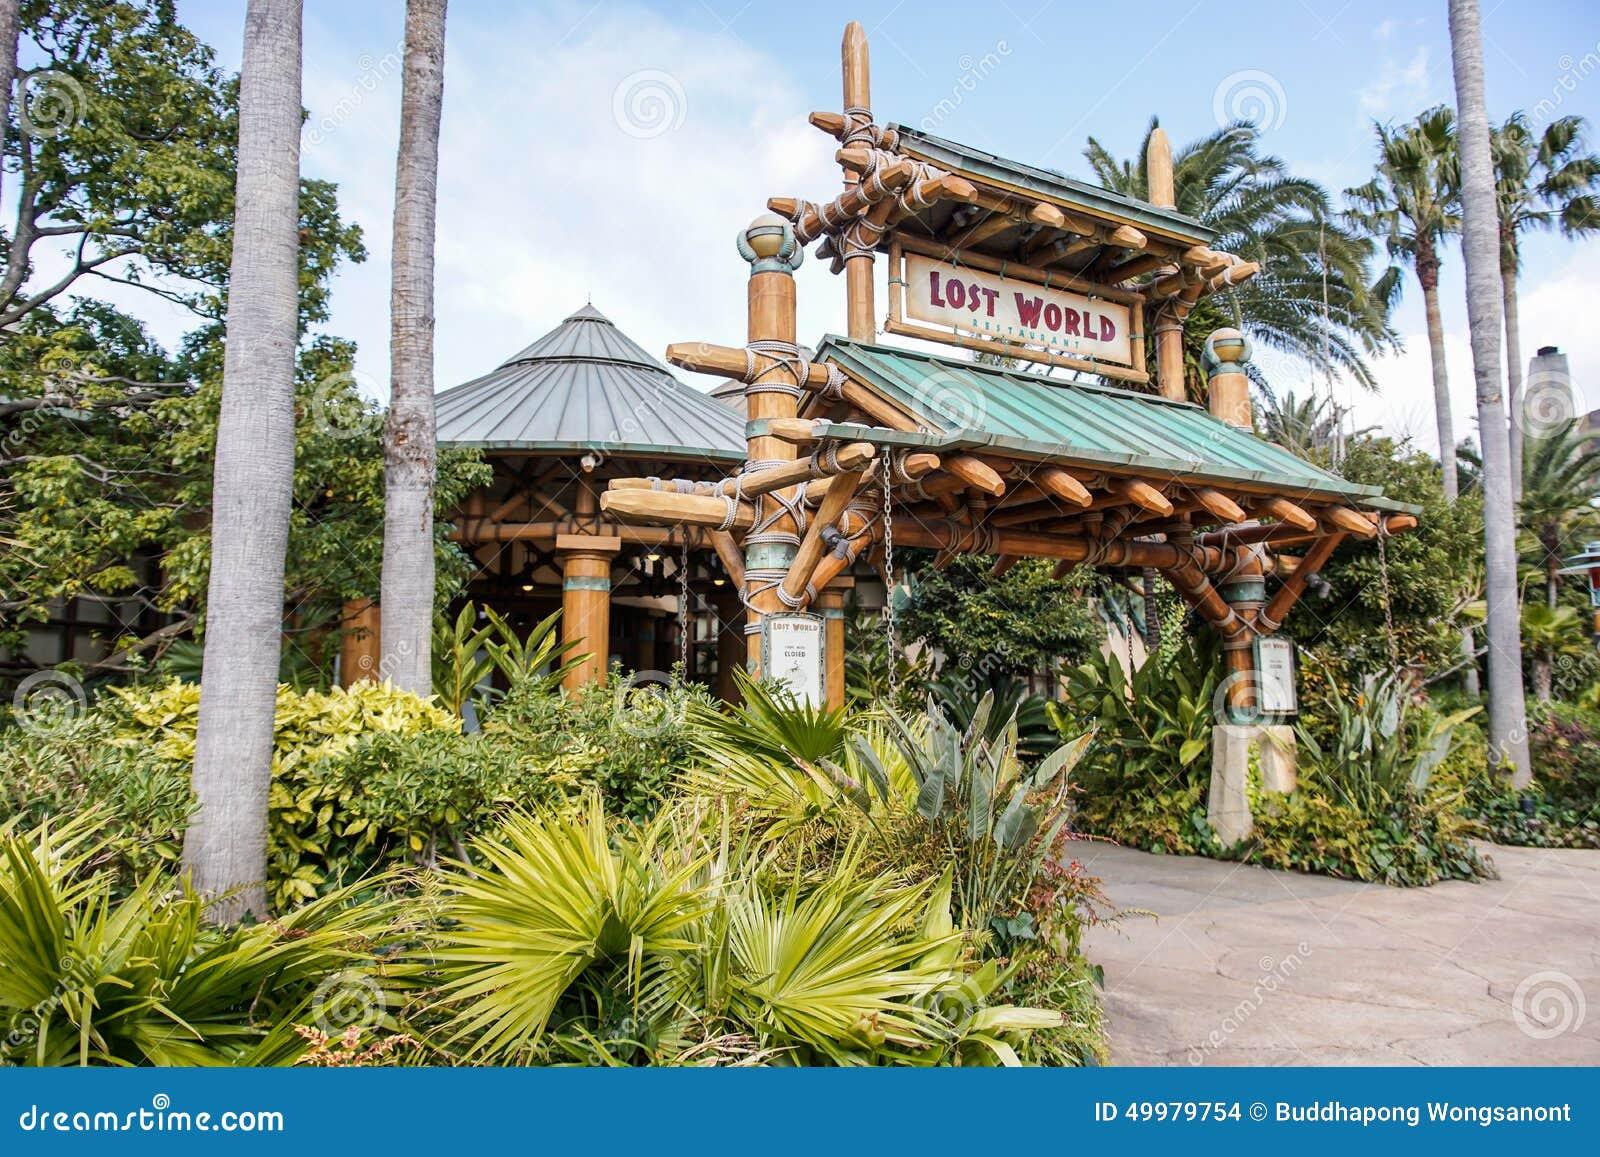 Time Travel To Jurassic Island